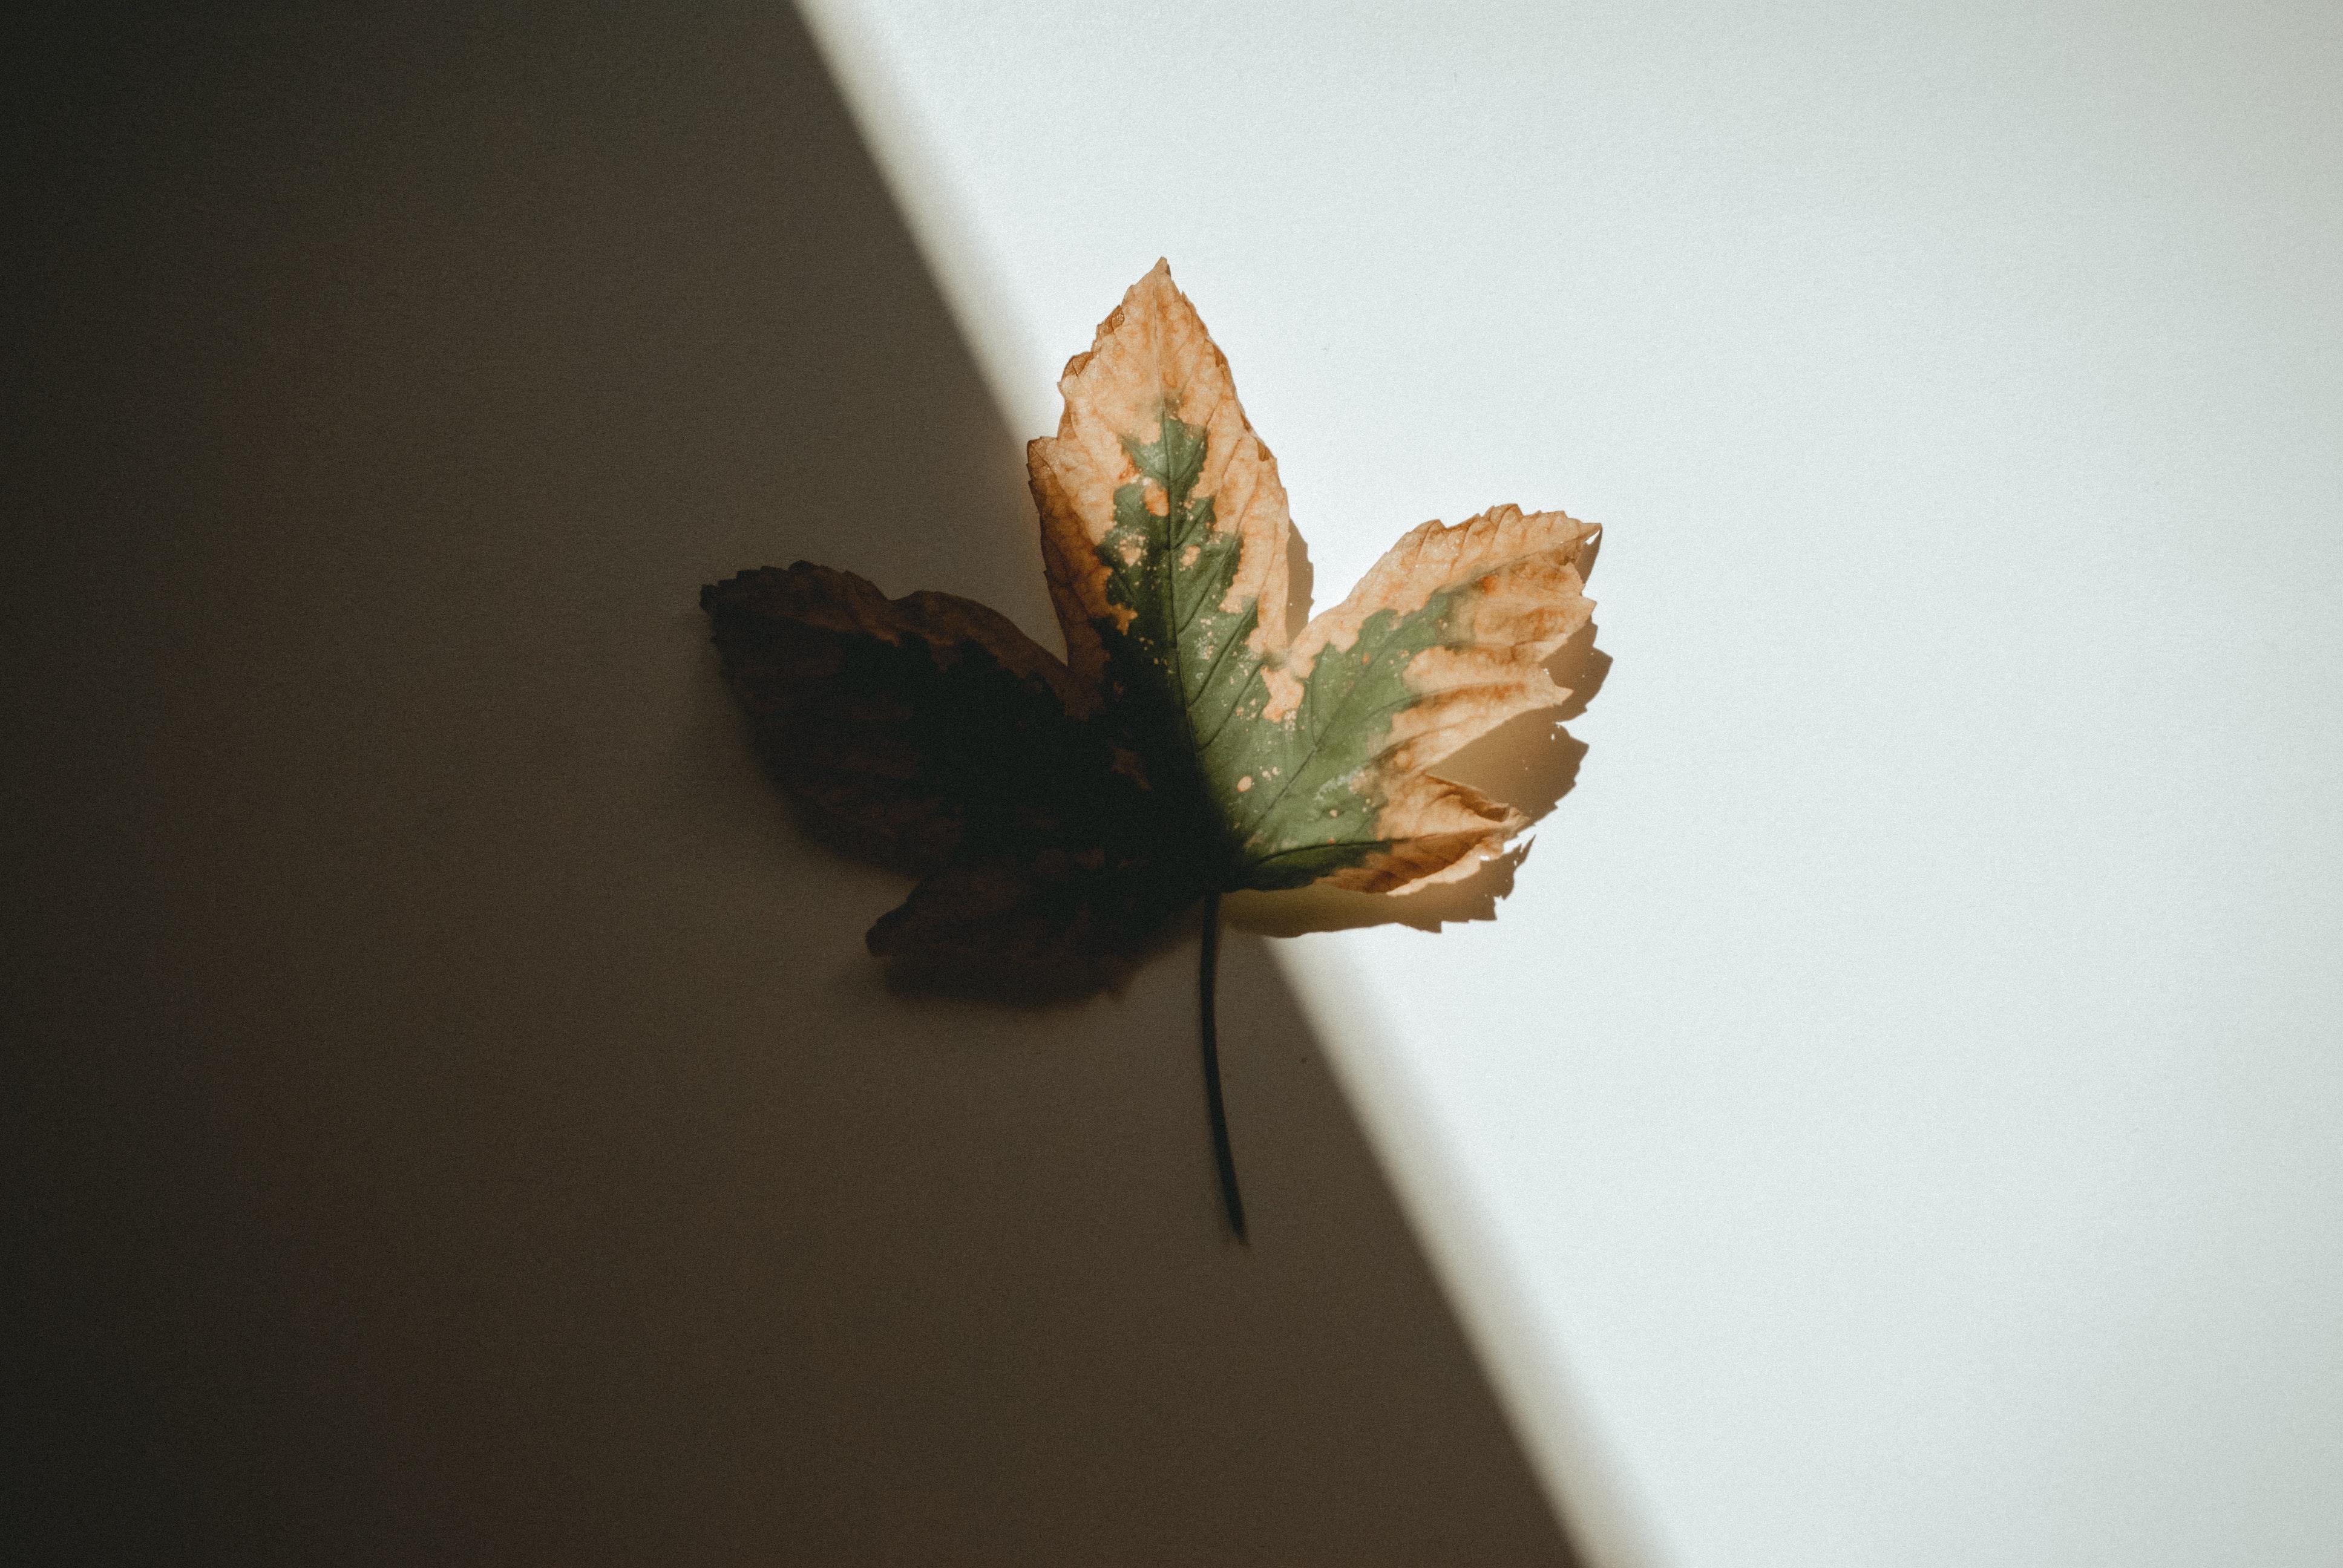 leaf brown plant tree paper maple leaf flower plane shadow plant stem still life photography 1534515